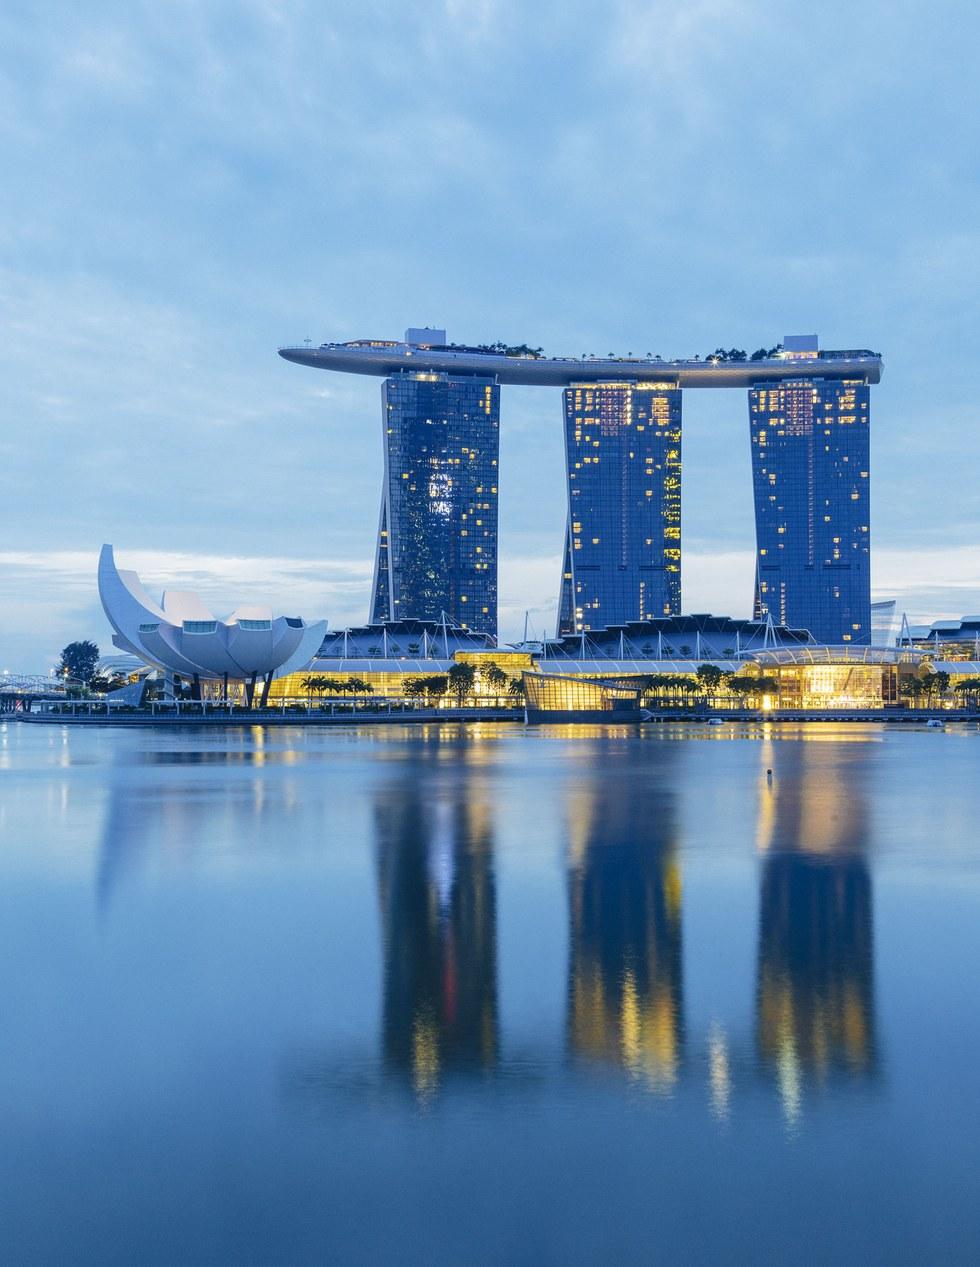 The skyline-dominating Marina Bay Sands resort and casino